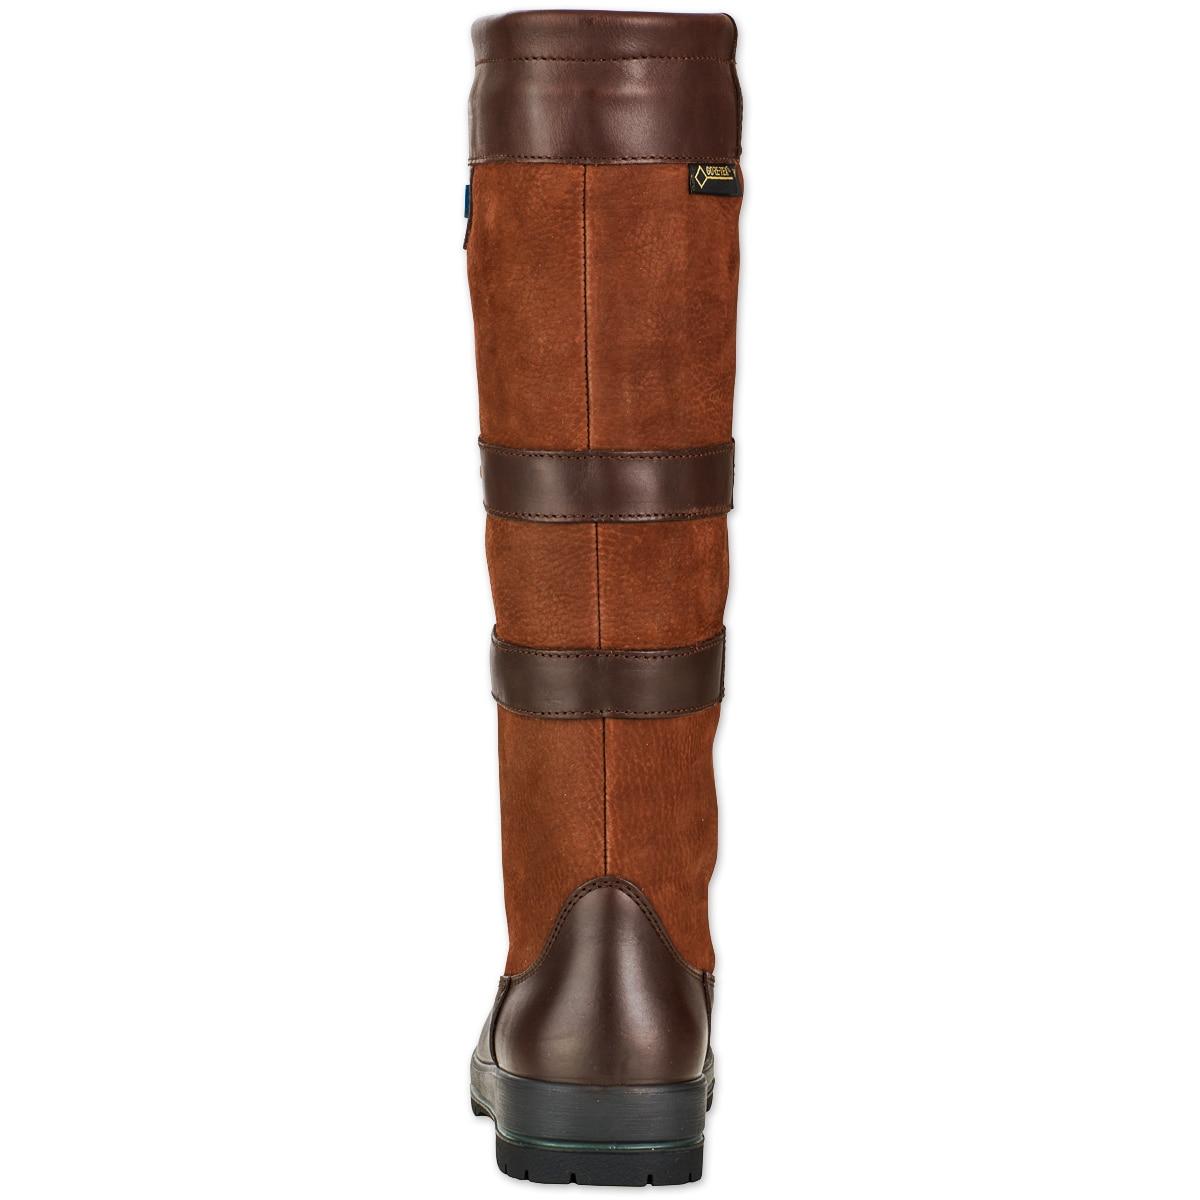 b55f277c3ea23 Dubarry Galway SlimFit Boot